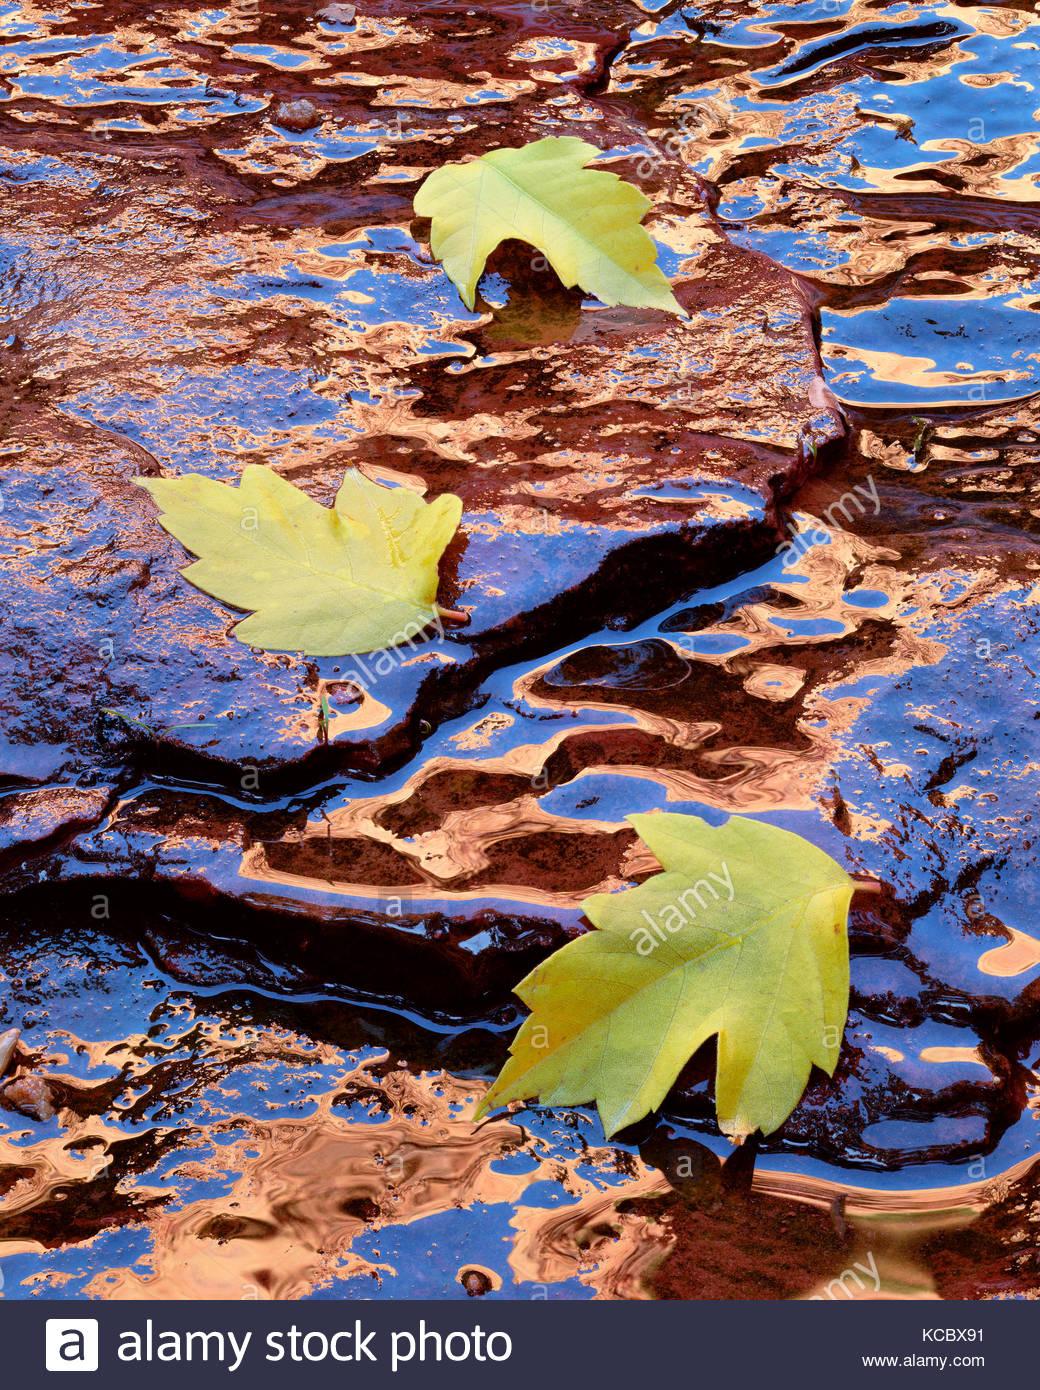 Boxelder Leaves fallen on Spring Seep, Kolob Canyons, Zion National Park, Utah - Stock Image